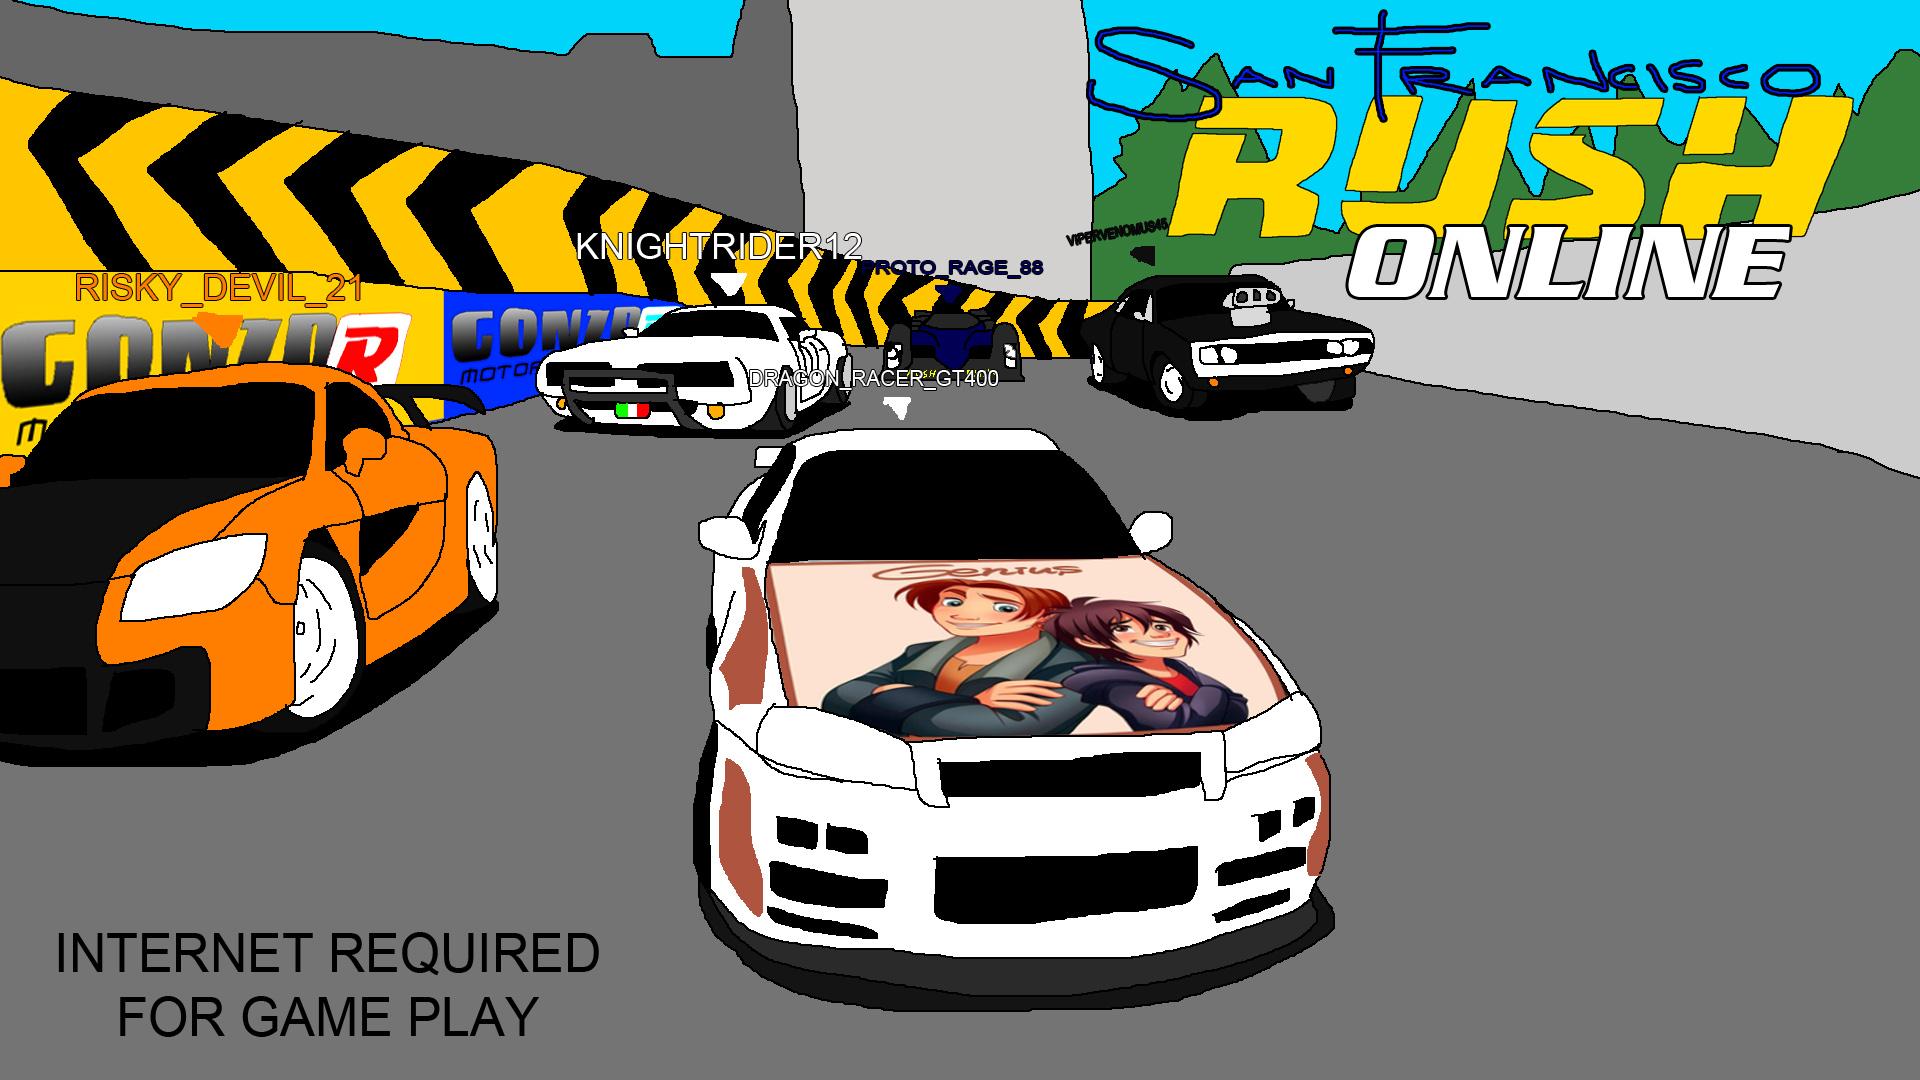 San Francisco Rush Online by Rainbow-Dash-Rockz